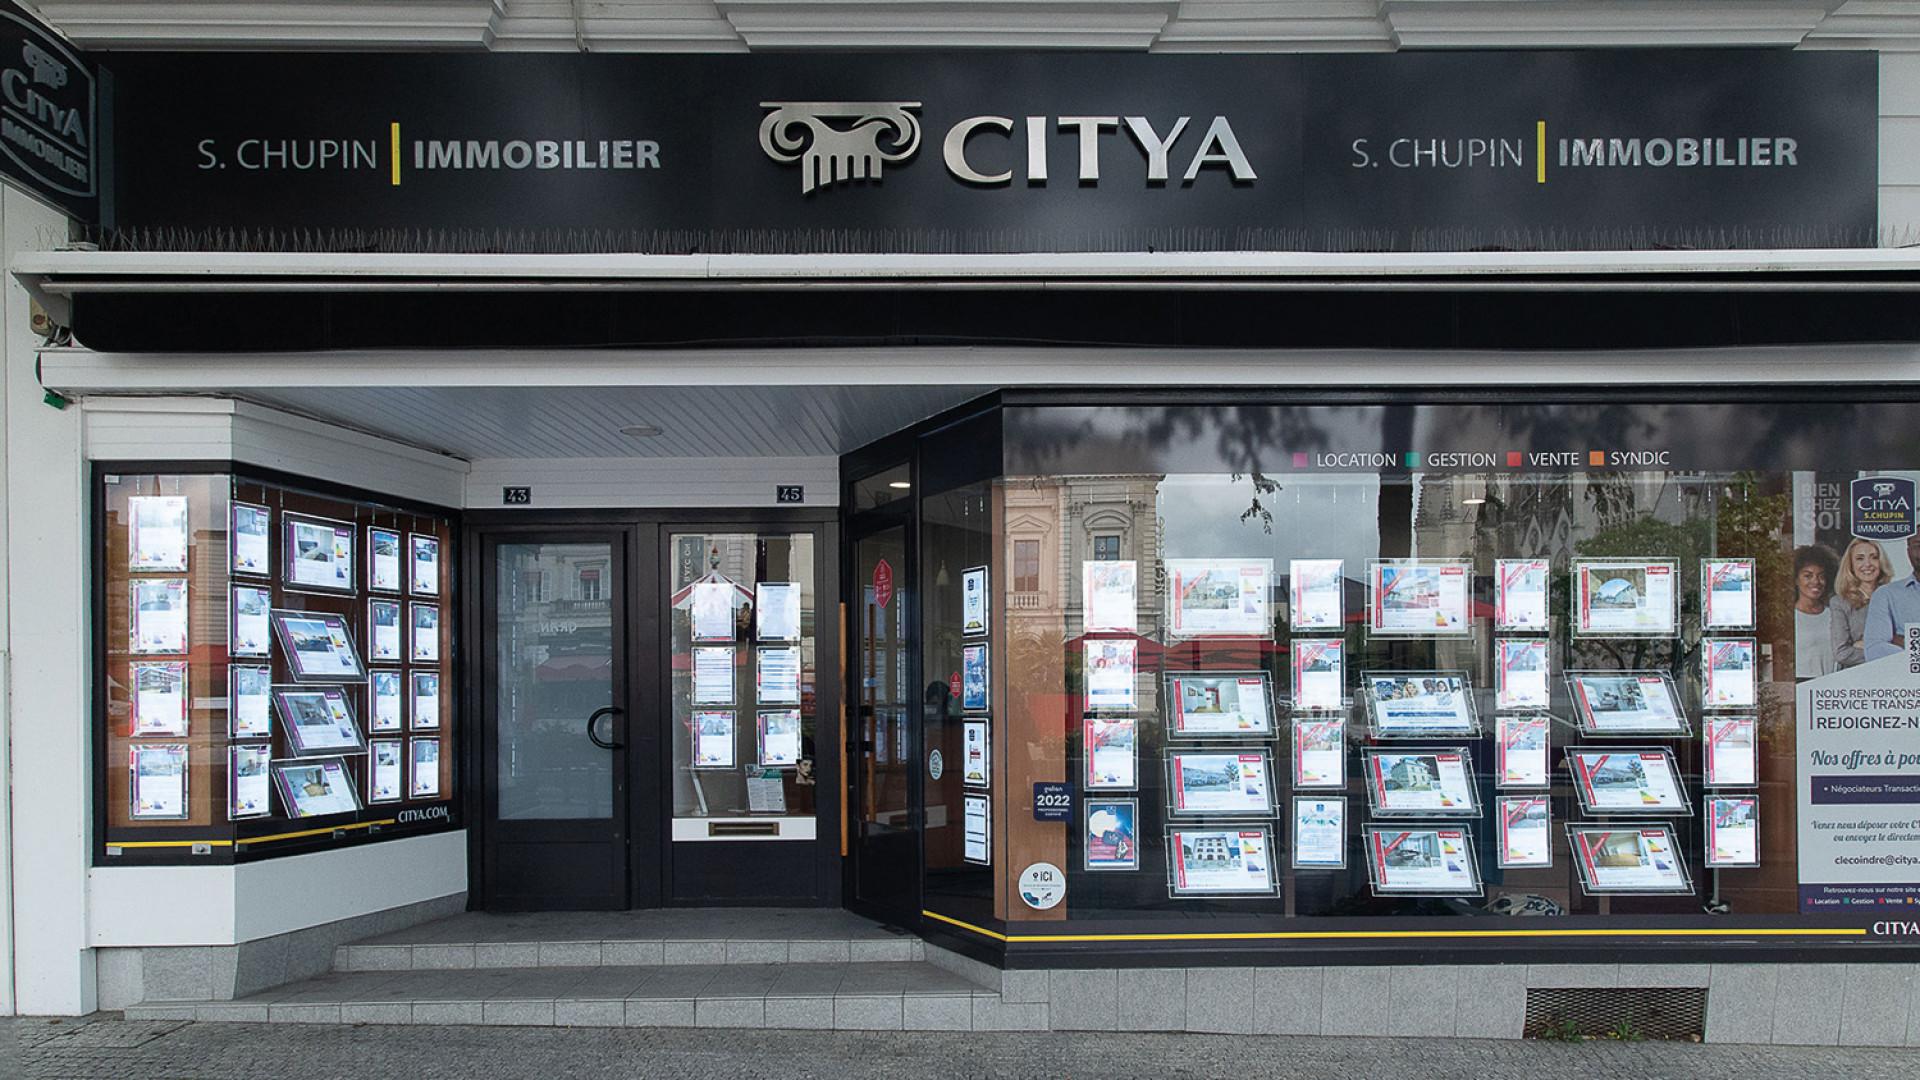 Agence immo Citya Immobilier S. Chupin